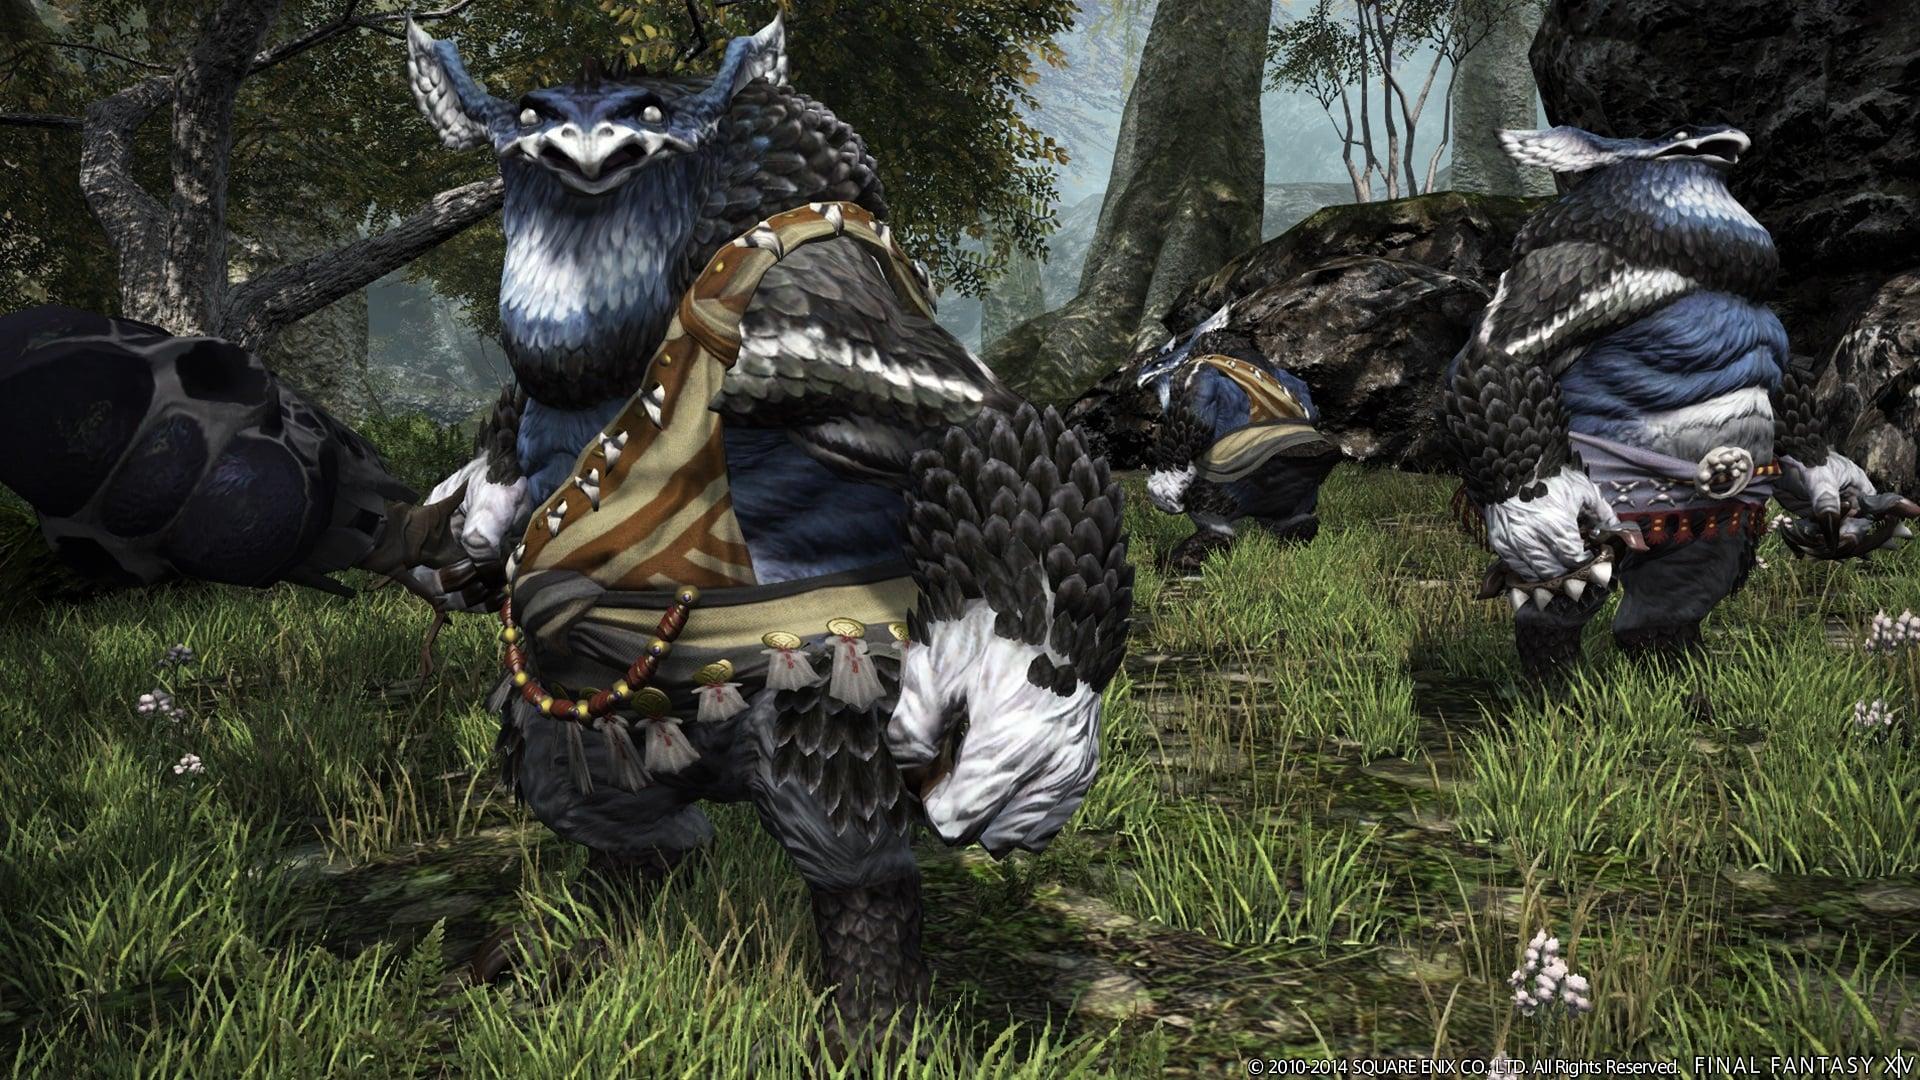 Final Fantasy XIV Heavensward Details